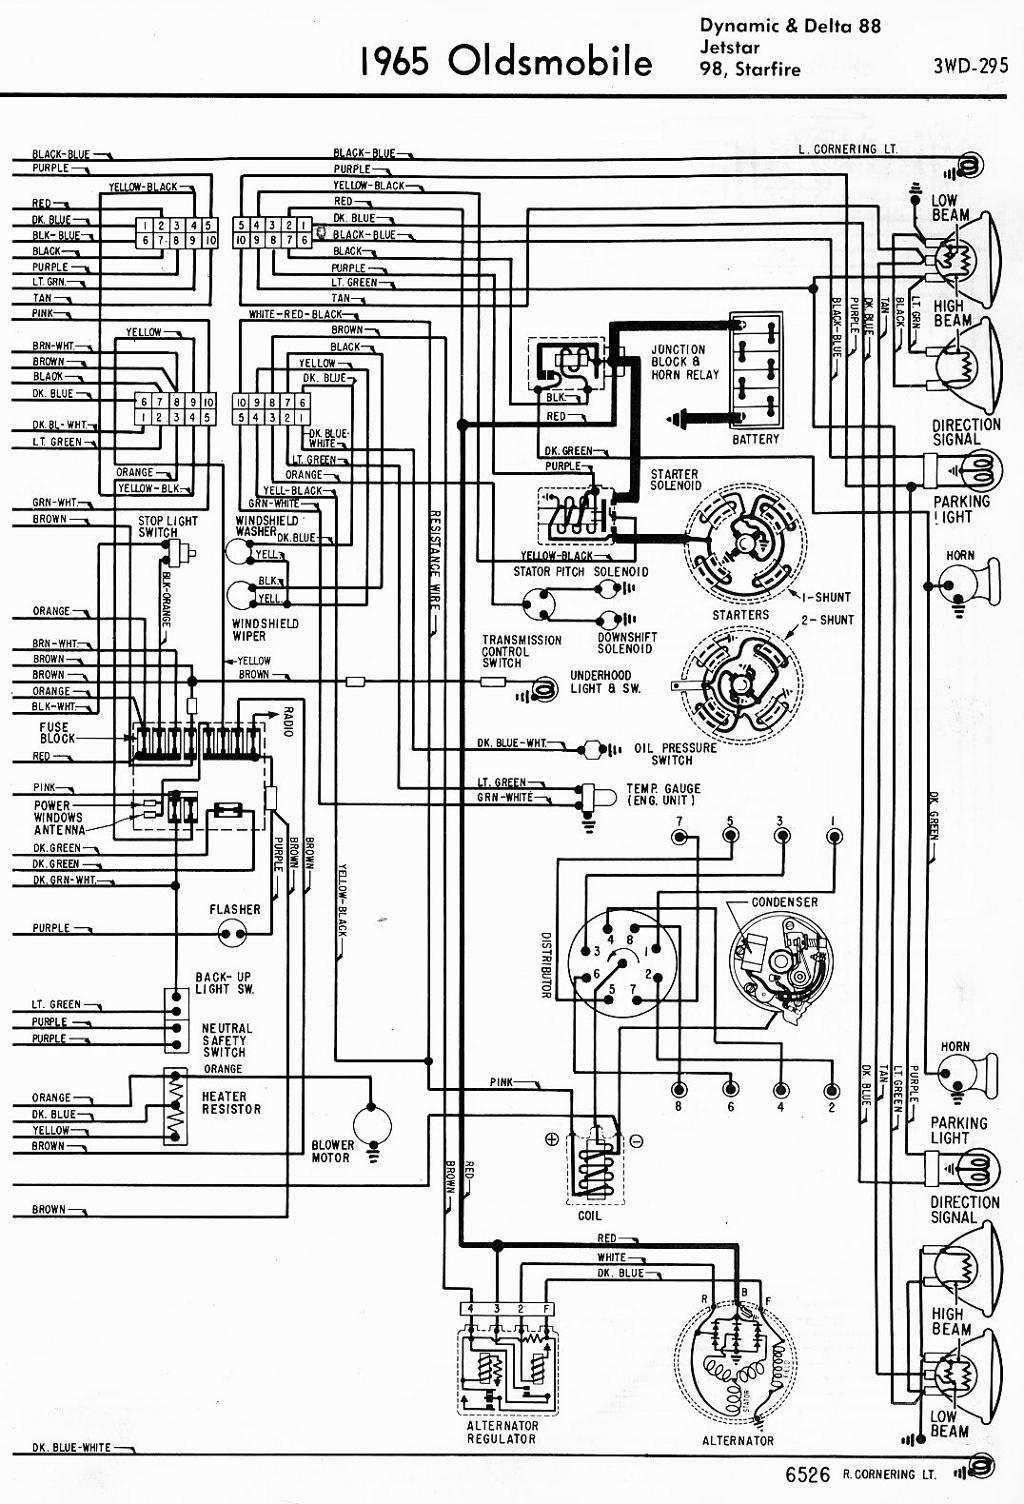 hight resolution of 2008 nissan pathfinder instrument panel wiring diagram 1977 celica interior 1977 toyota celica wiring diagram